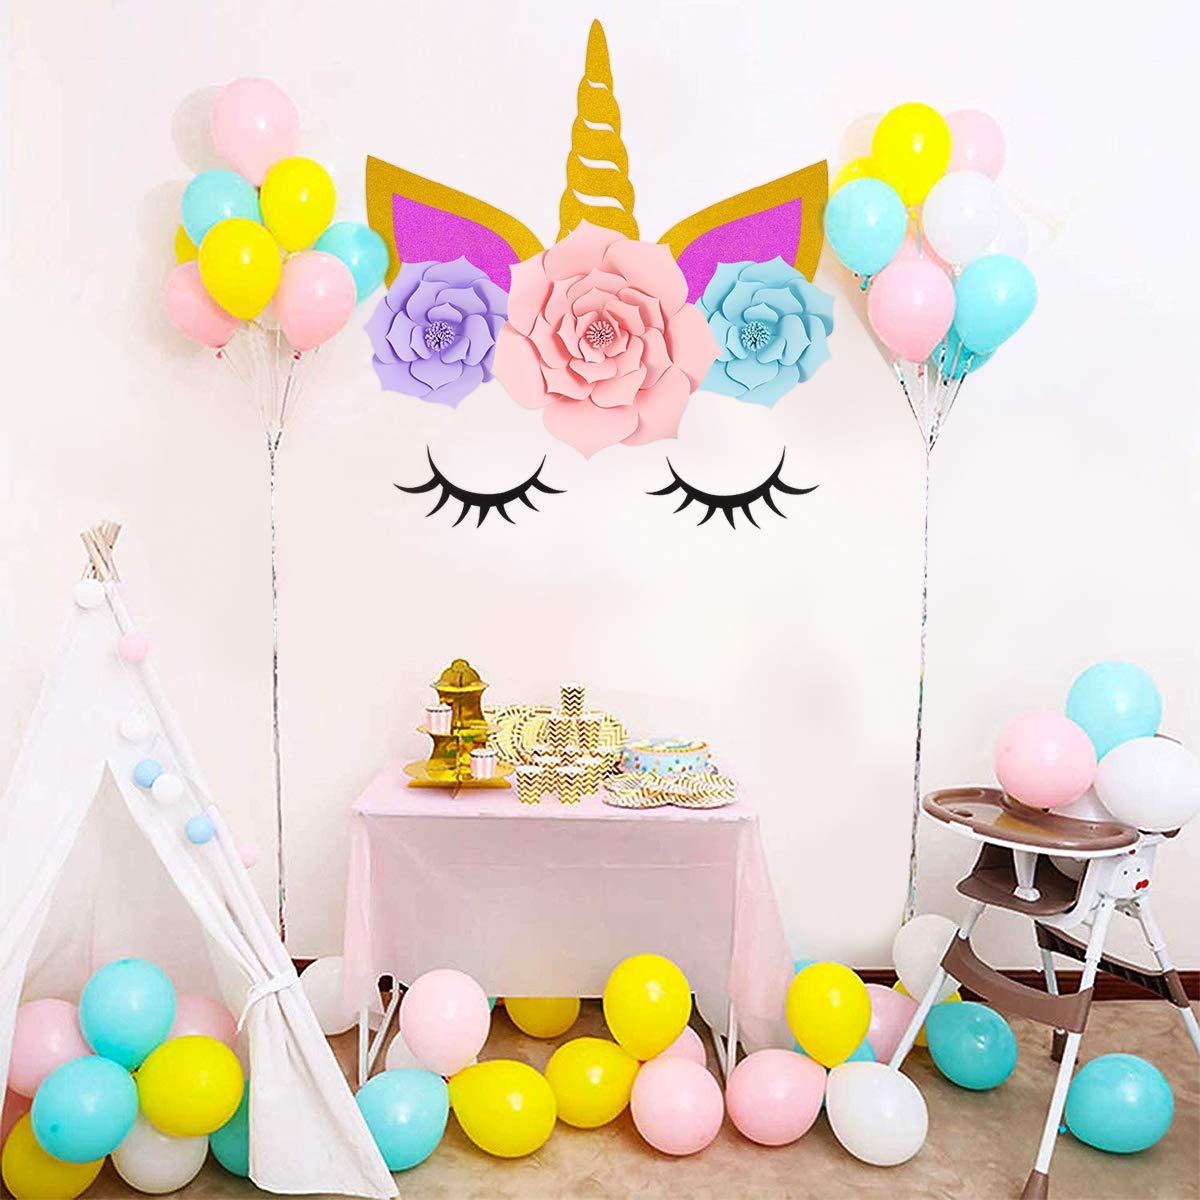 BESTOYARD Unicornio con Flor DIY Decoraciones de Fiesta Unicornio Cumpleaños Bautizo Fondo Unicornio para Foto